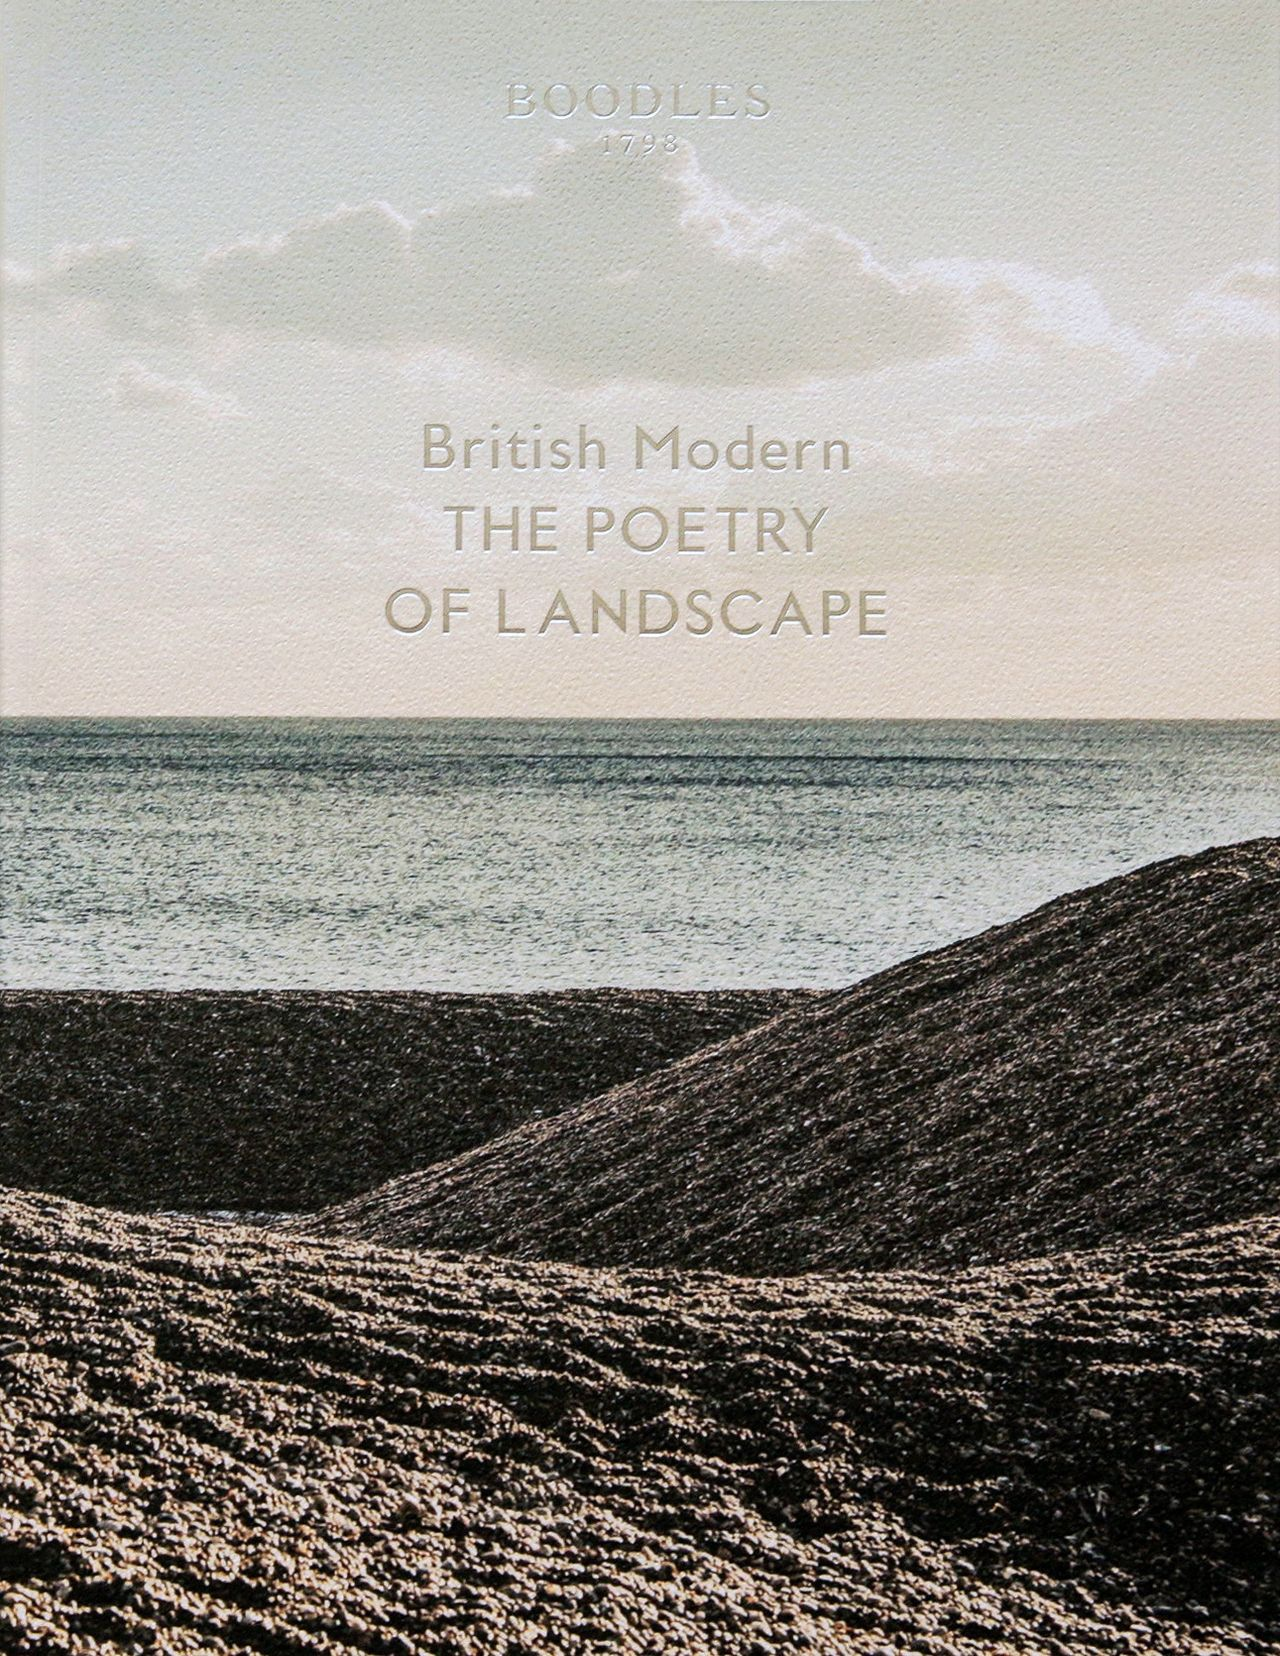 Boodles: British Modern, Michael Harrison